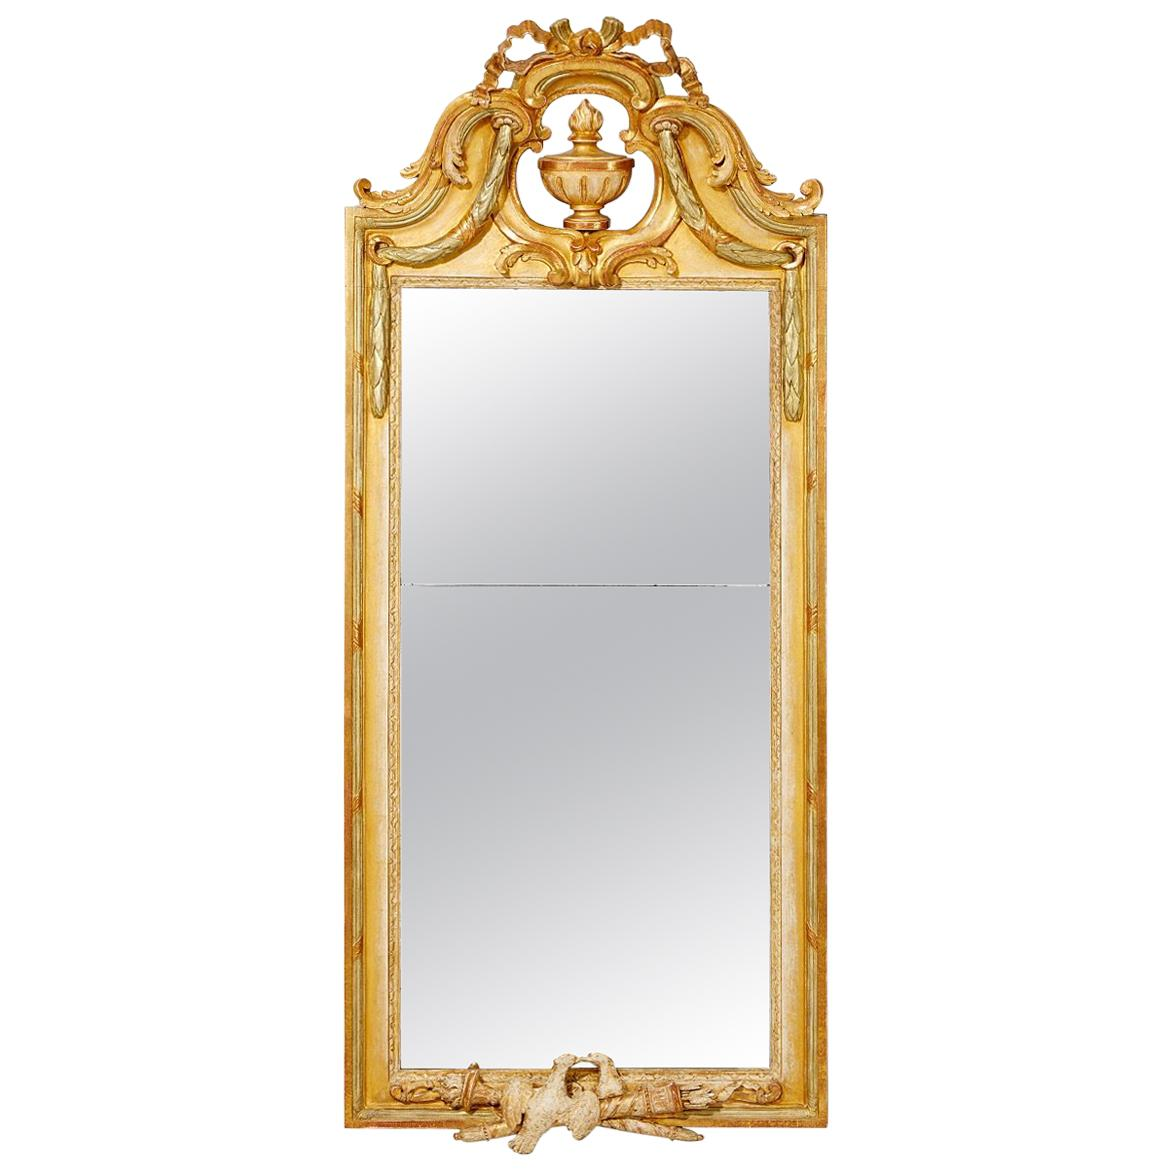 Swedish Gustavian Mirror, 18th Century Signed Johan Åkerblad, Stockholm